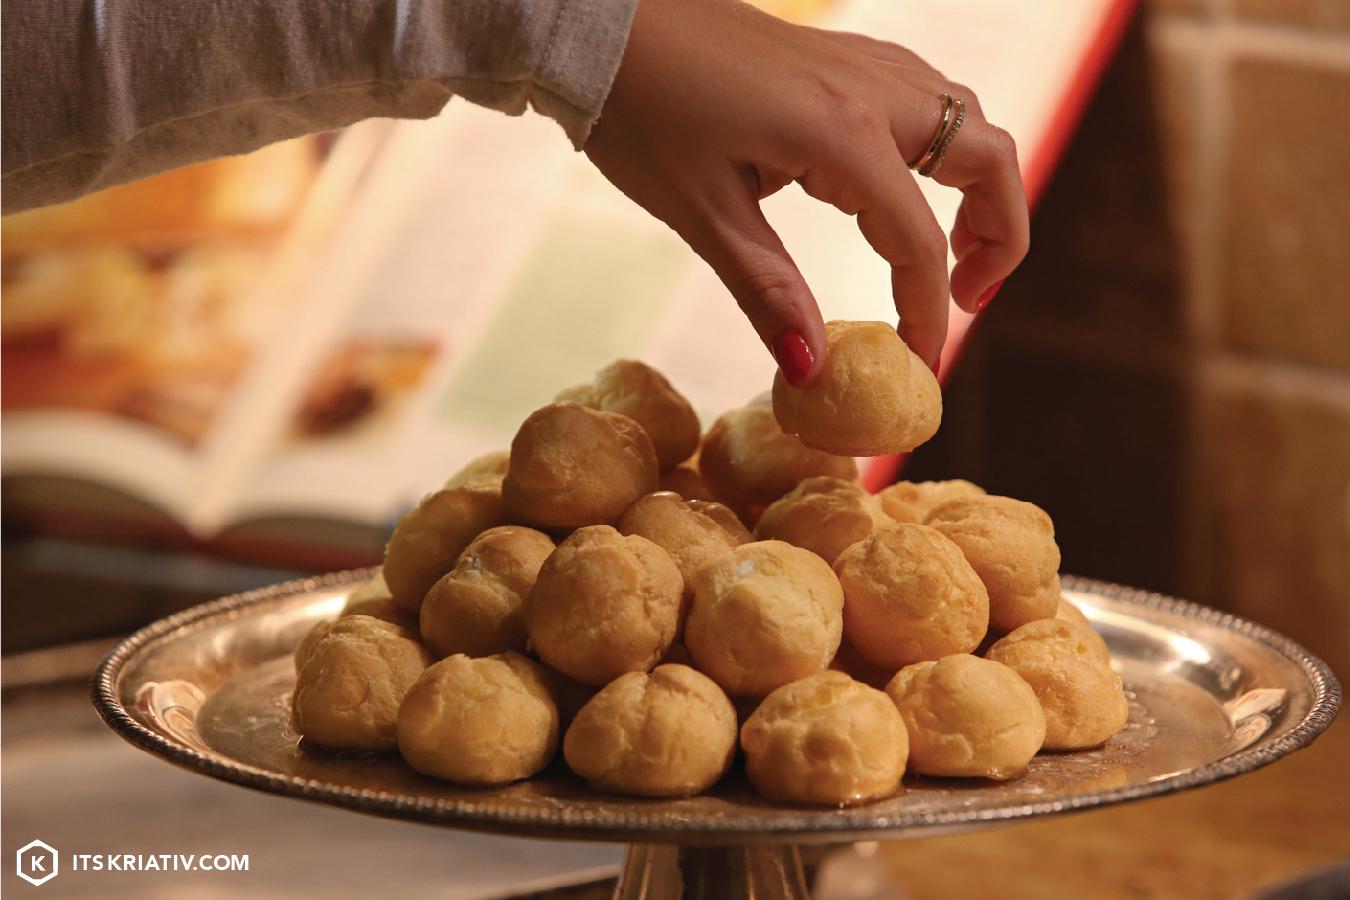 Its-Kriativ-Food-Holiday-Croquembouche-Dessert-Tree-Sugar.jpg